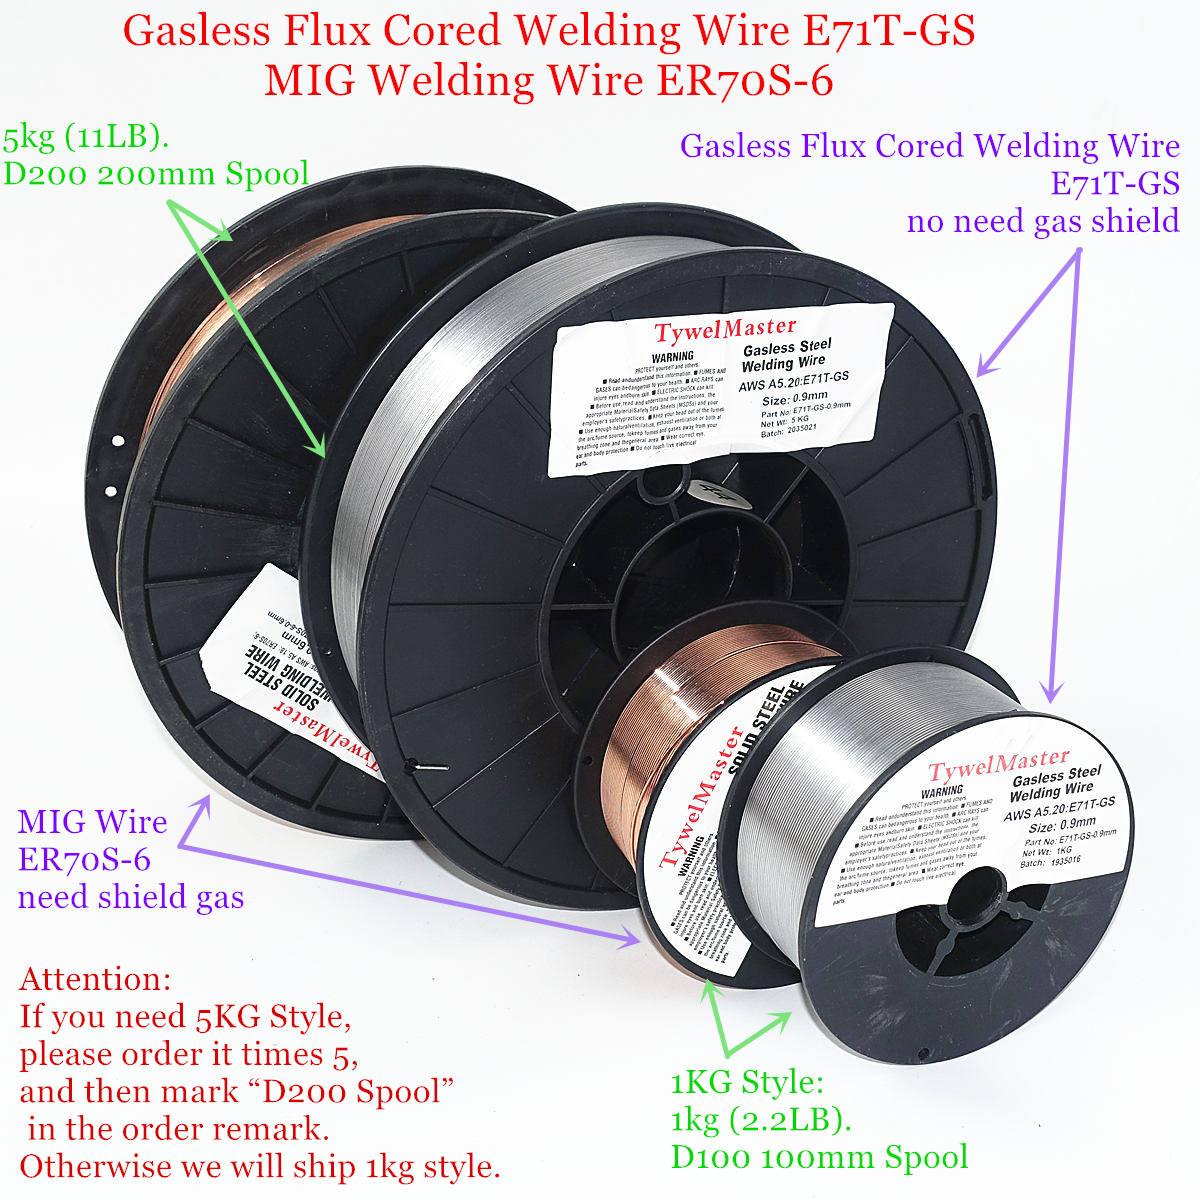 Flux Cored Gasless Welding Wire E71T-GS No Gas Or MIG Welding Wire ER70S-6 0.6/0.8/0.9mm 1kg Steel Welding Material